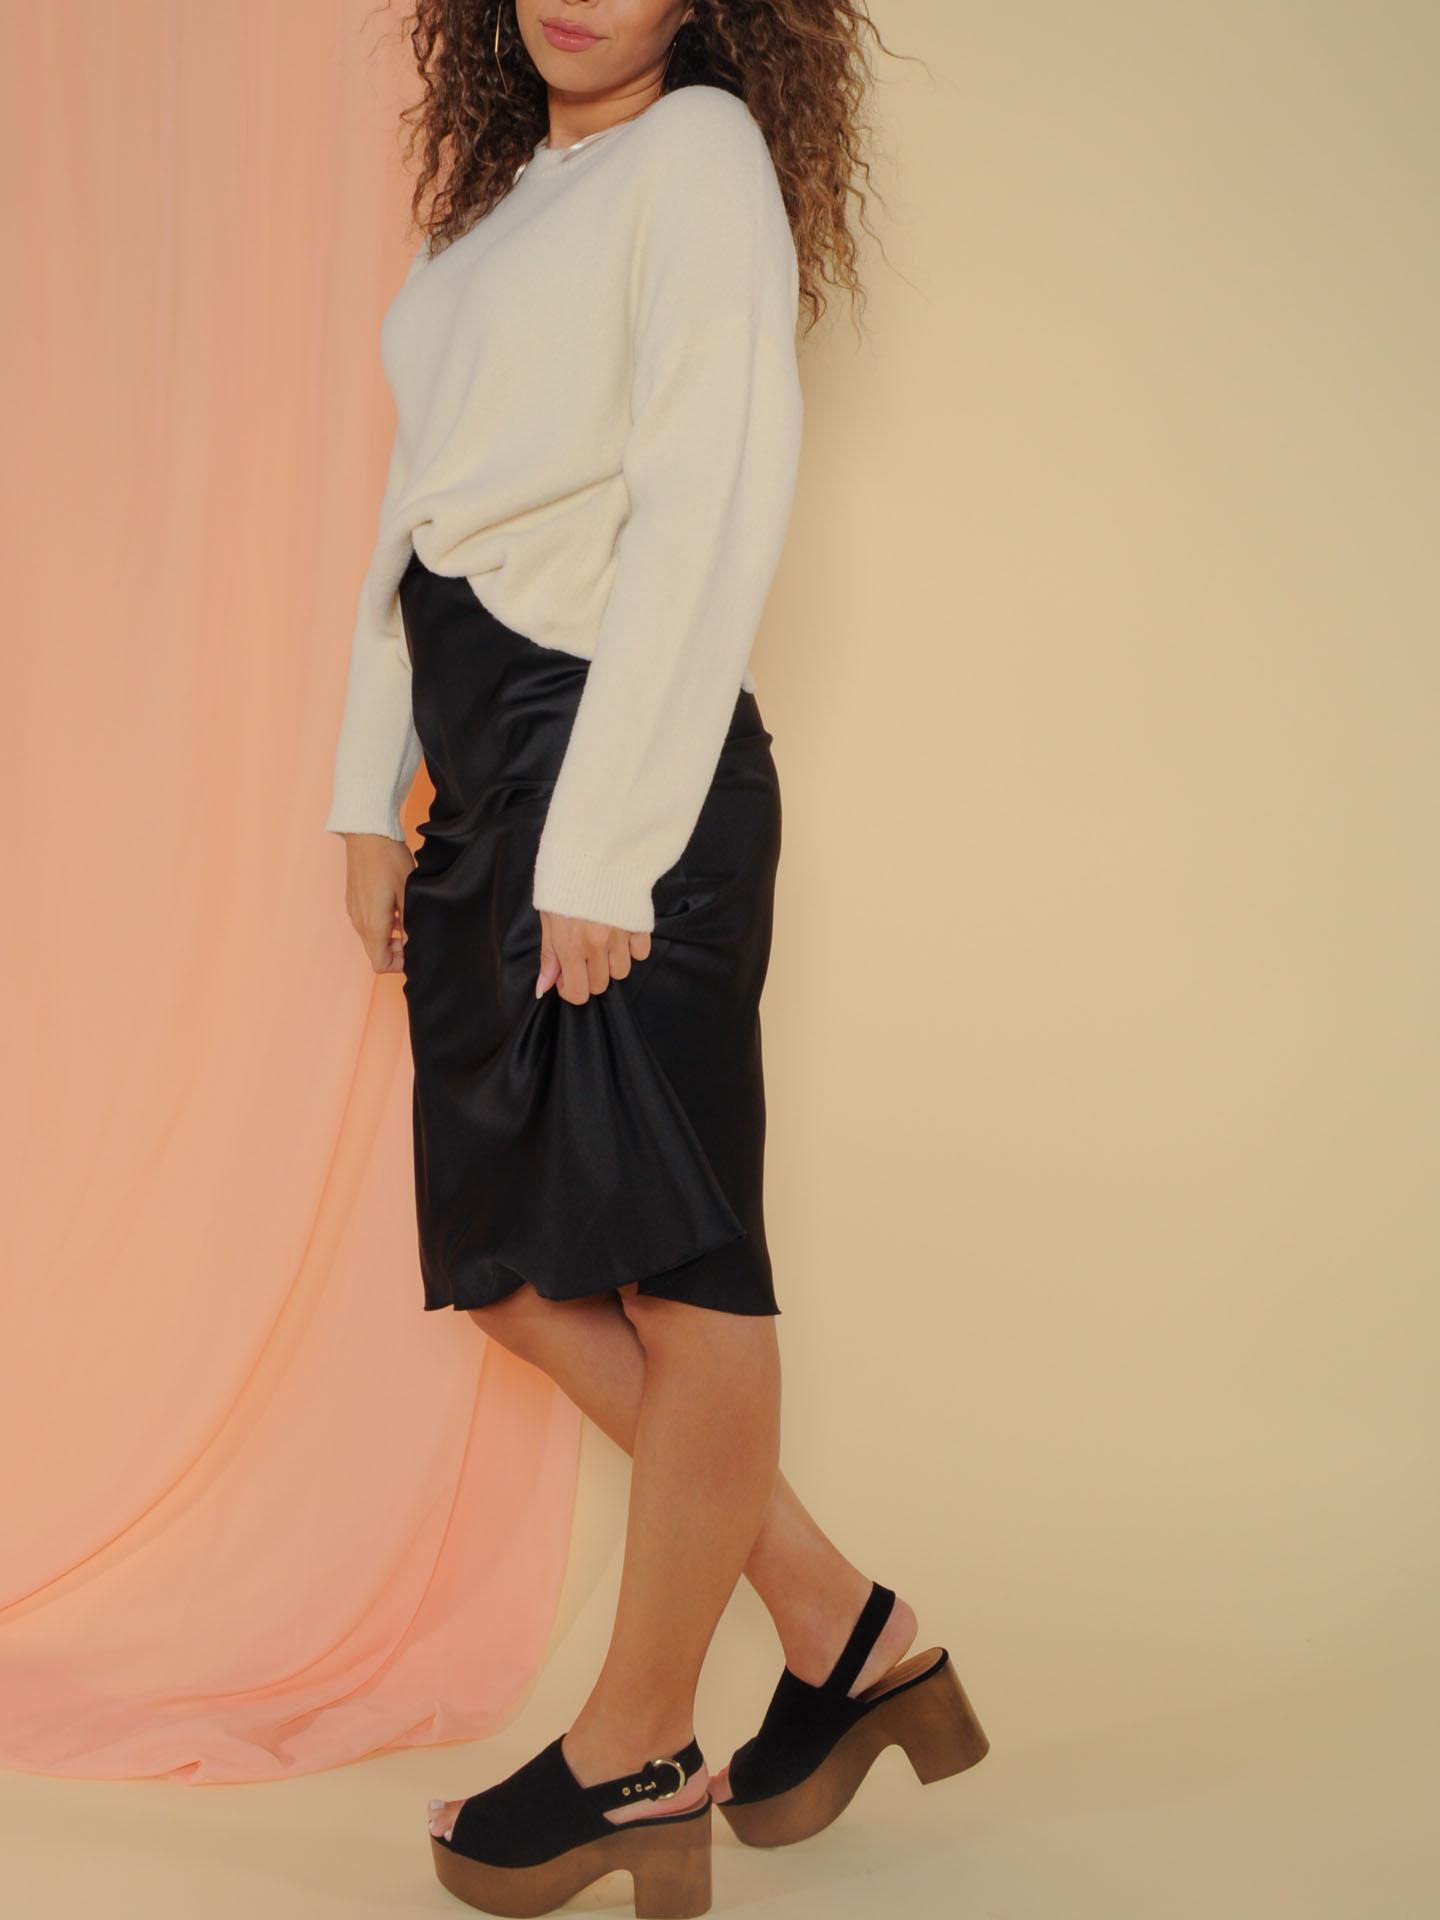 Superior Skirt Sleek and Satin Midi Black Side